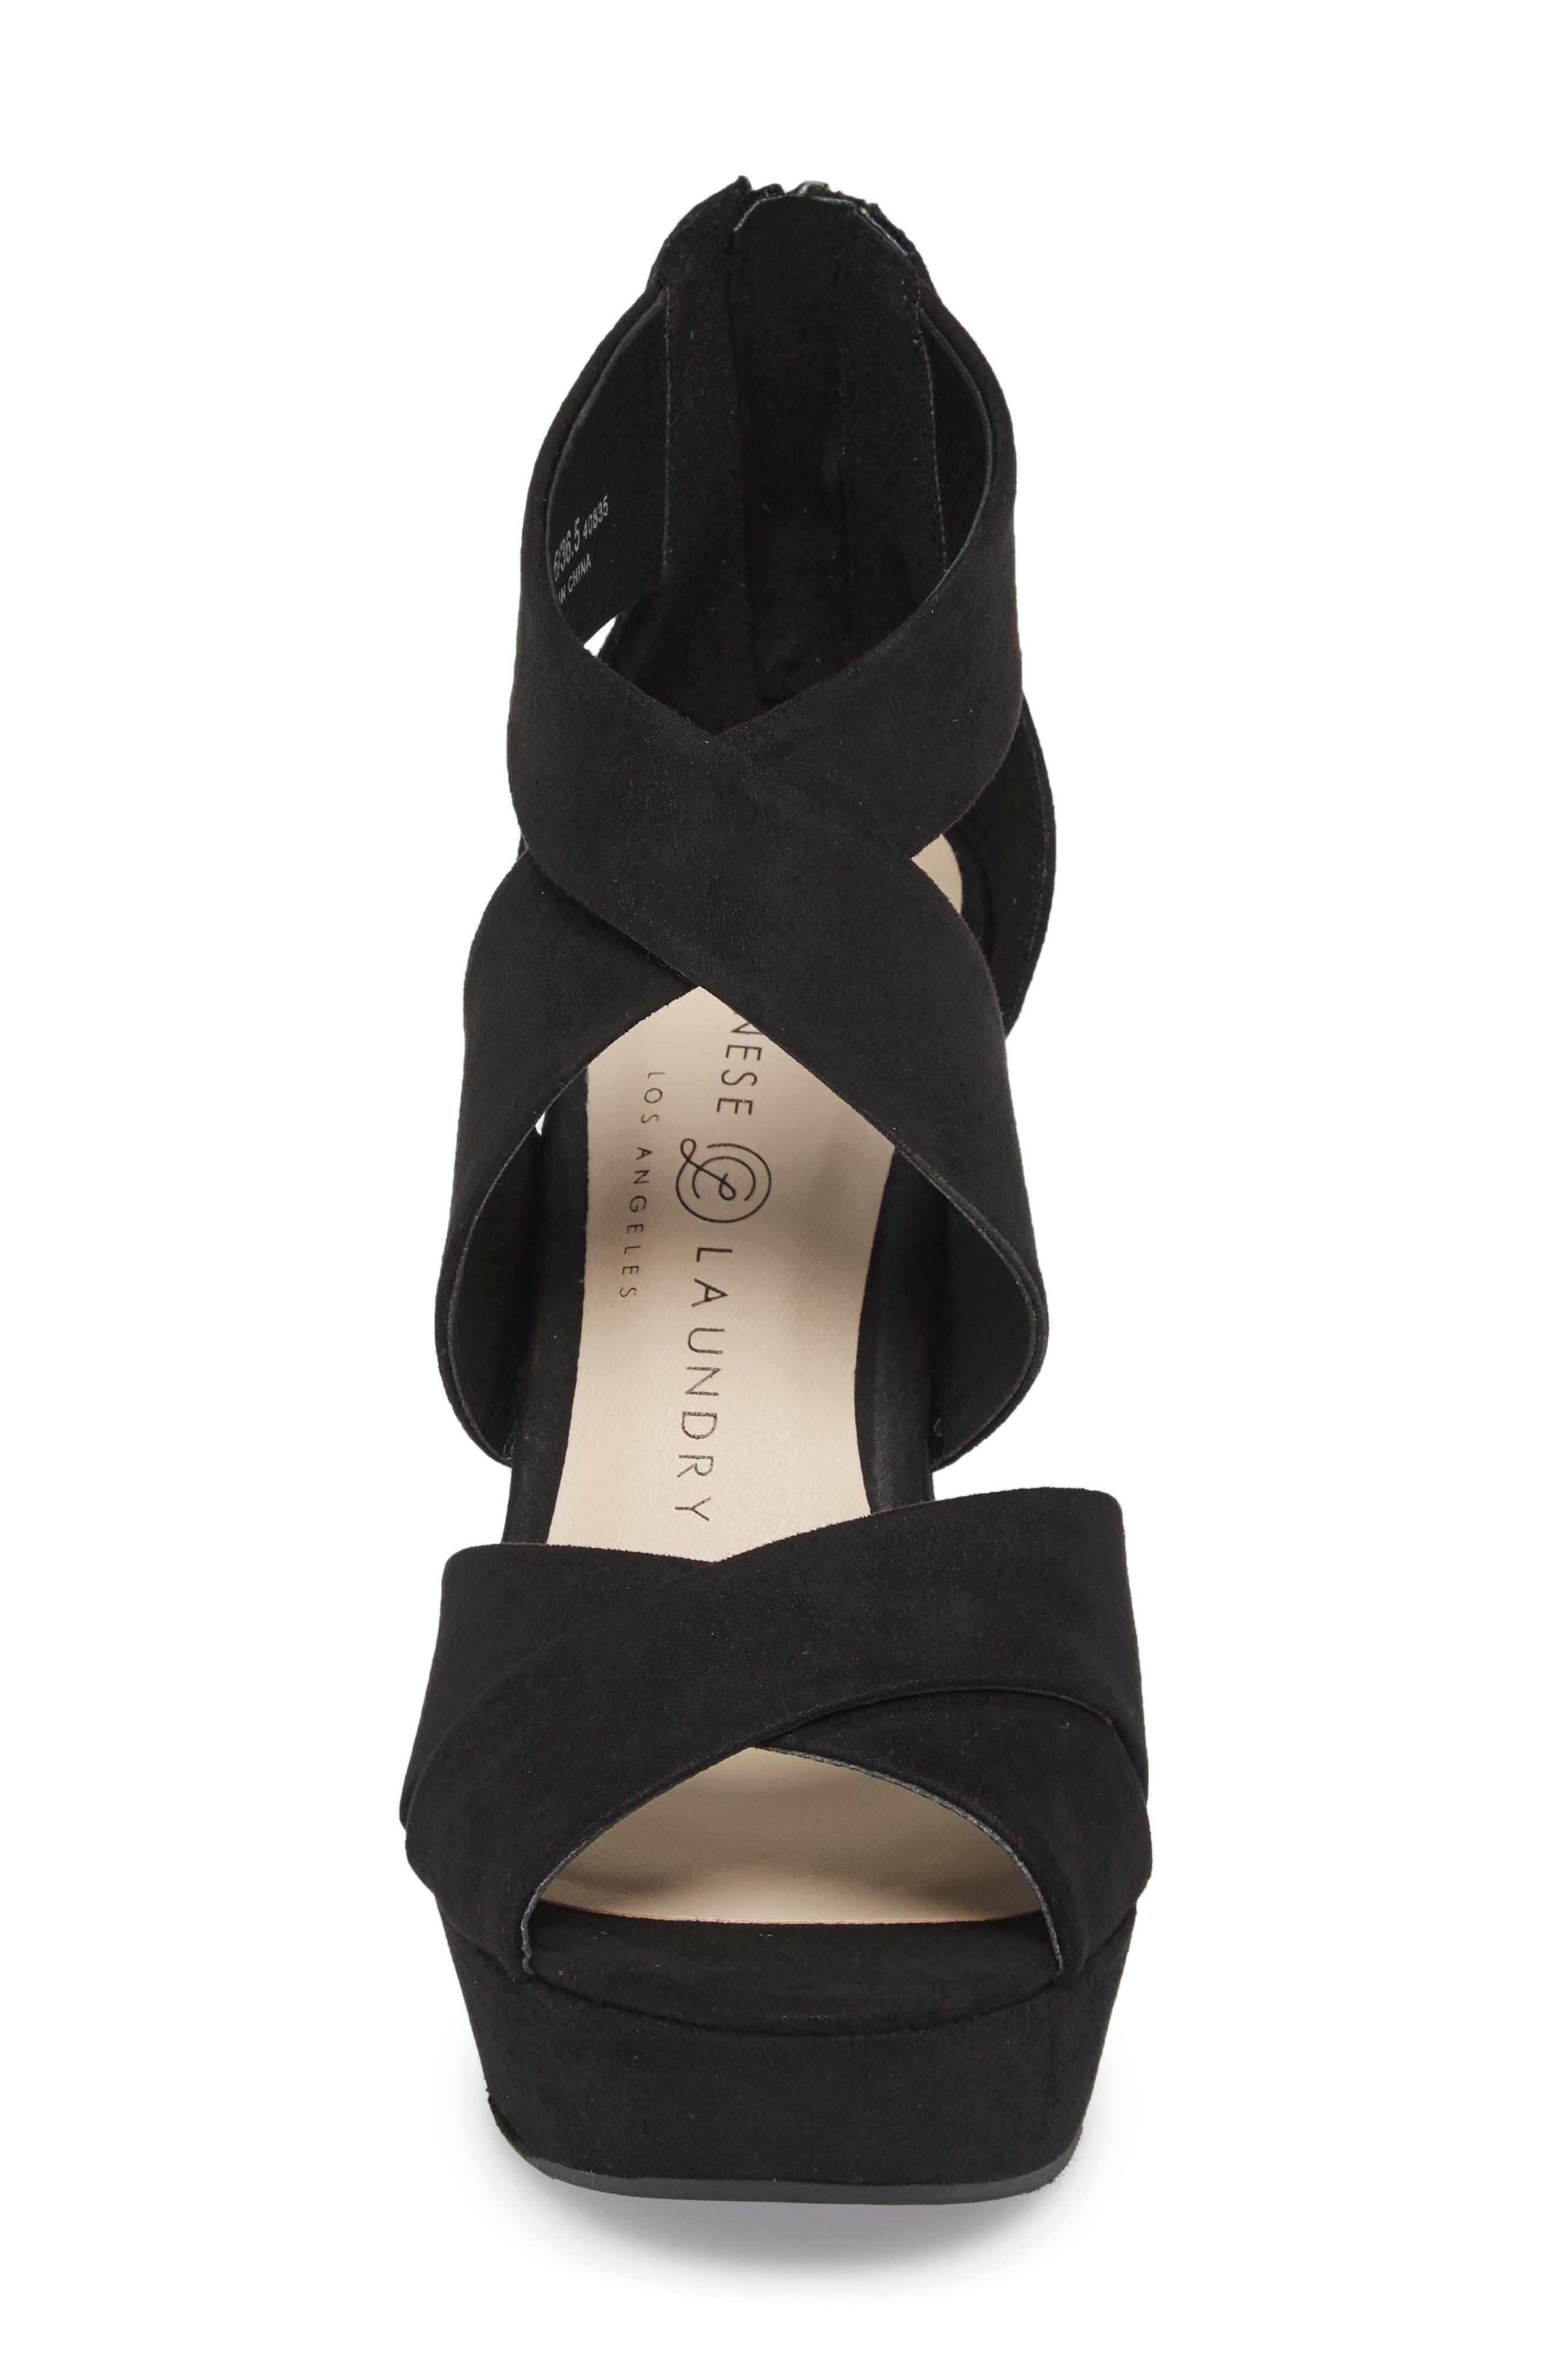 Milani Platform Wedge Sandal,                             Alternate thumbnail 4, color,                             005